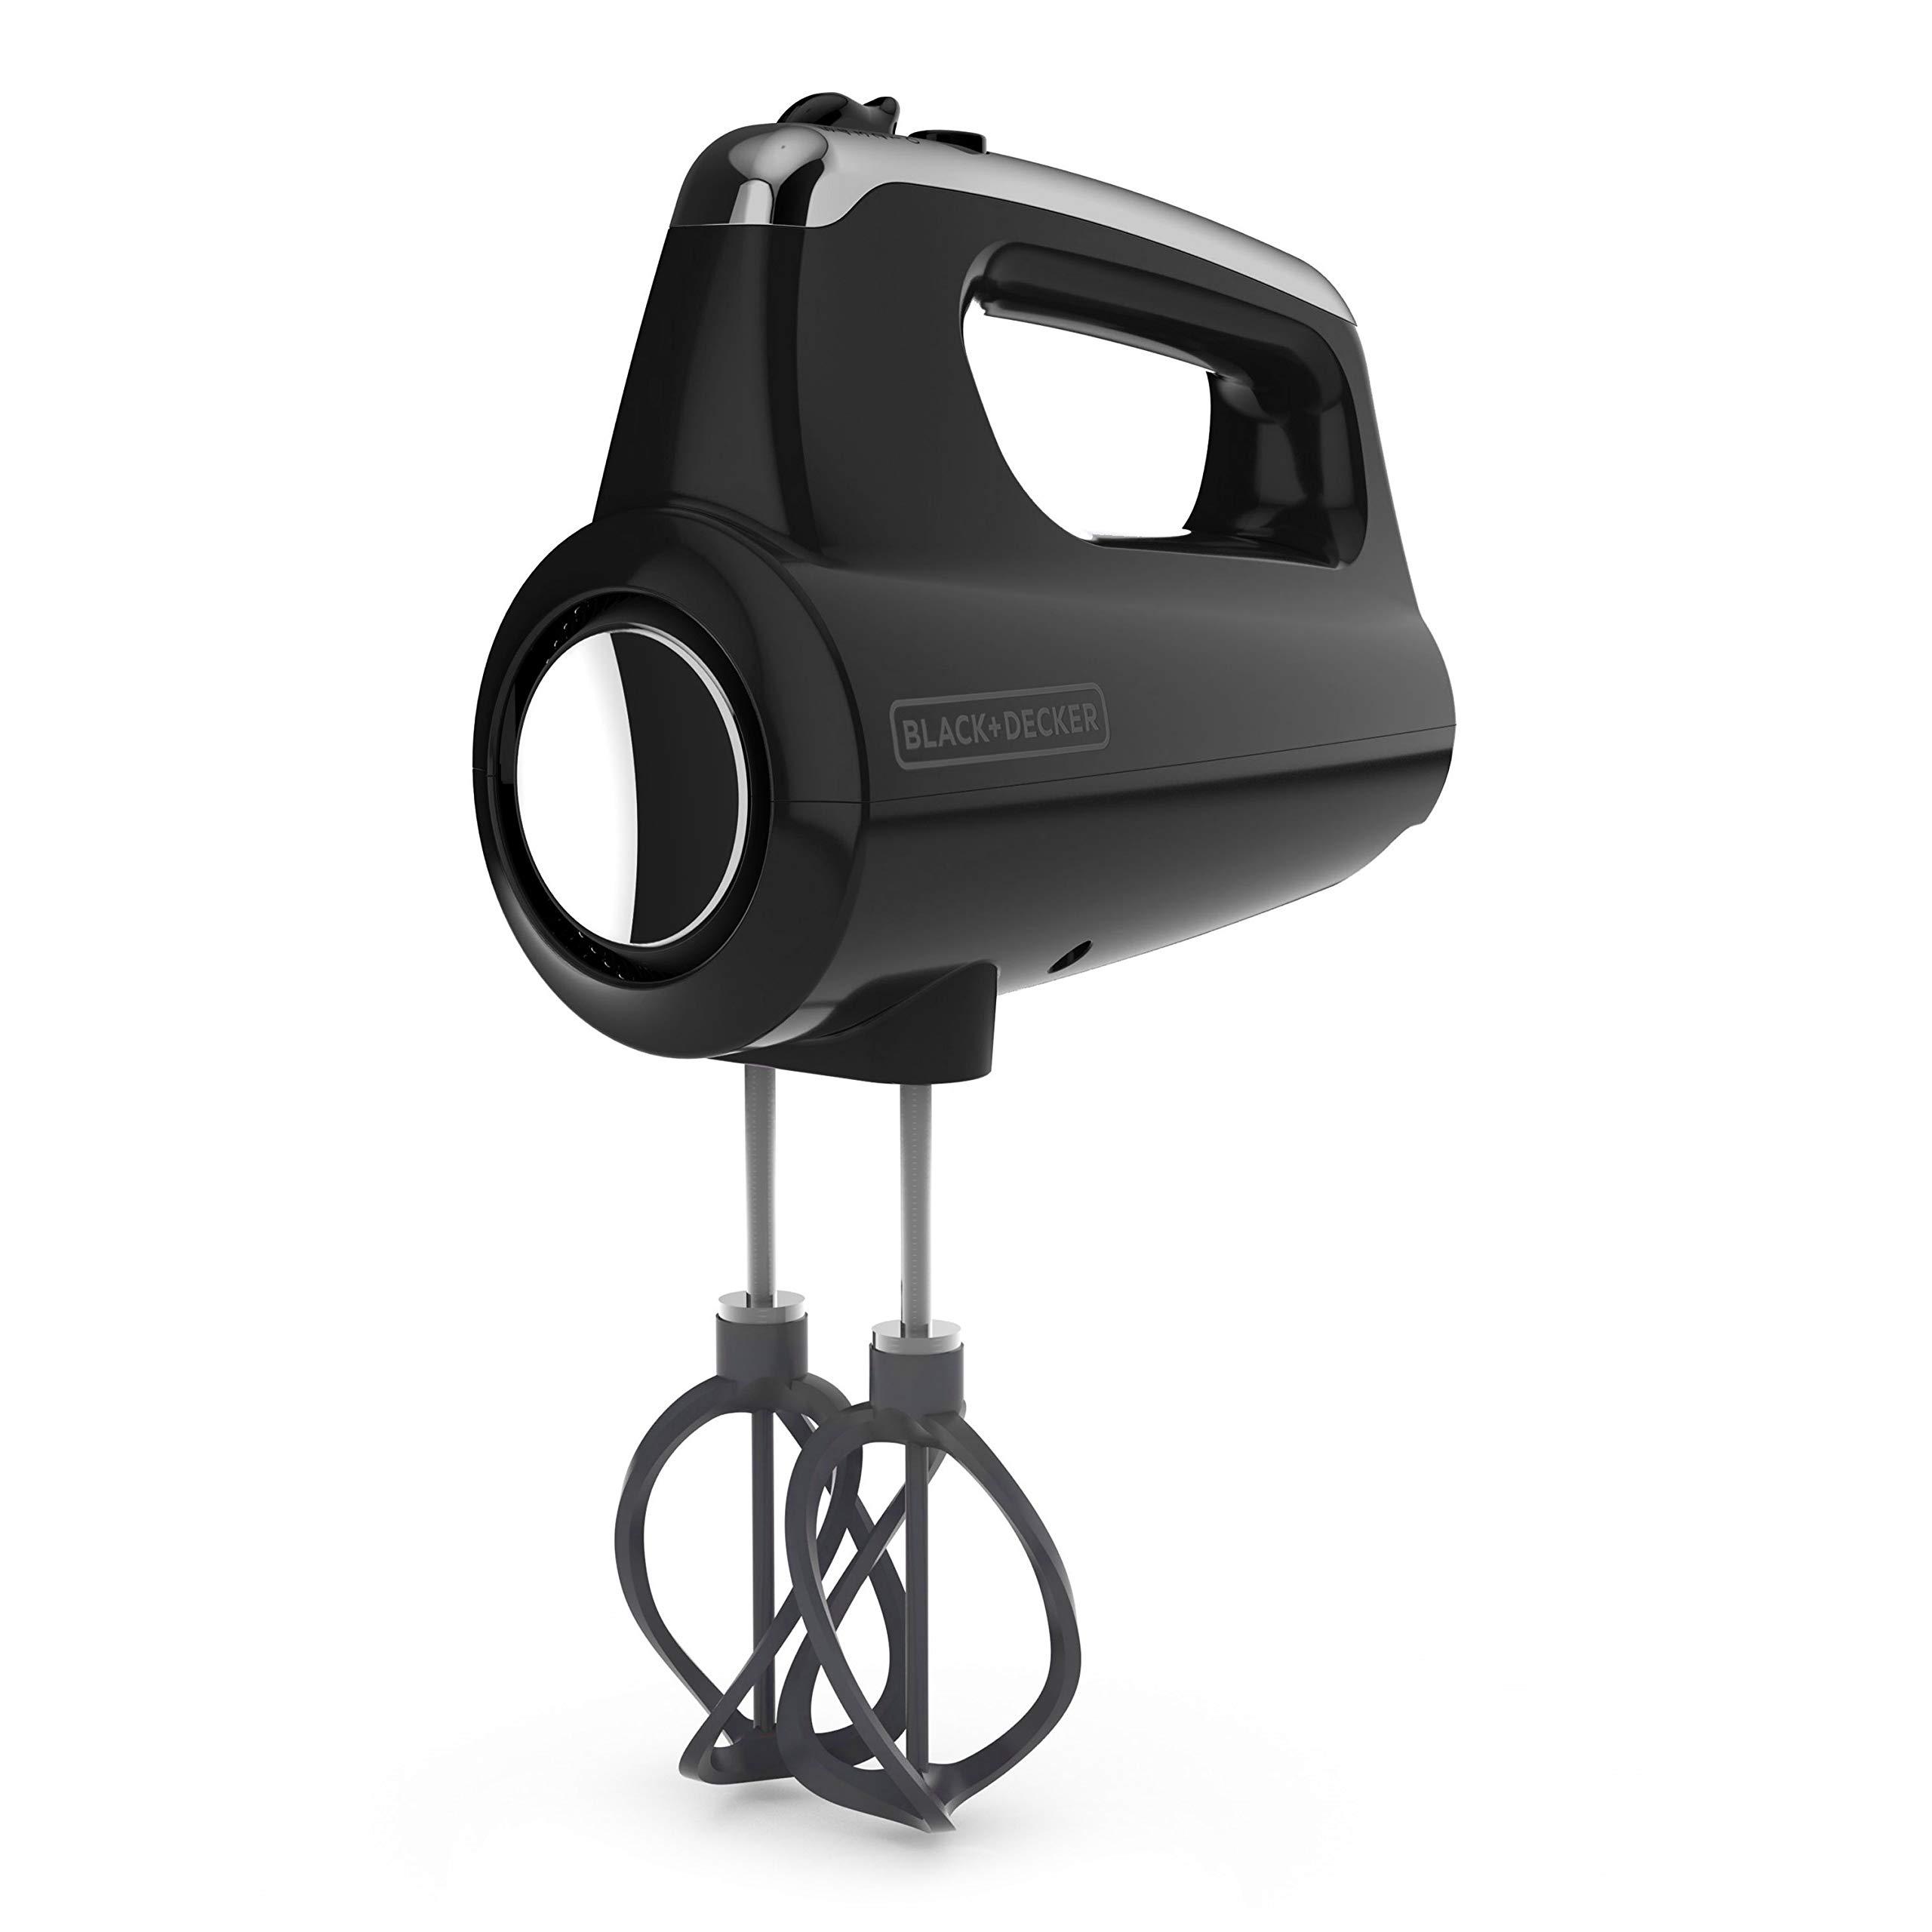 BLACK+DECKER MX600B Helix Performance Premium 5-Speed Hand Mixer, 5 Attachments + Case, Black by BLACK+DECKER